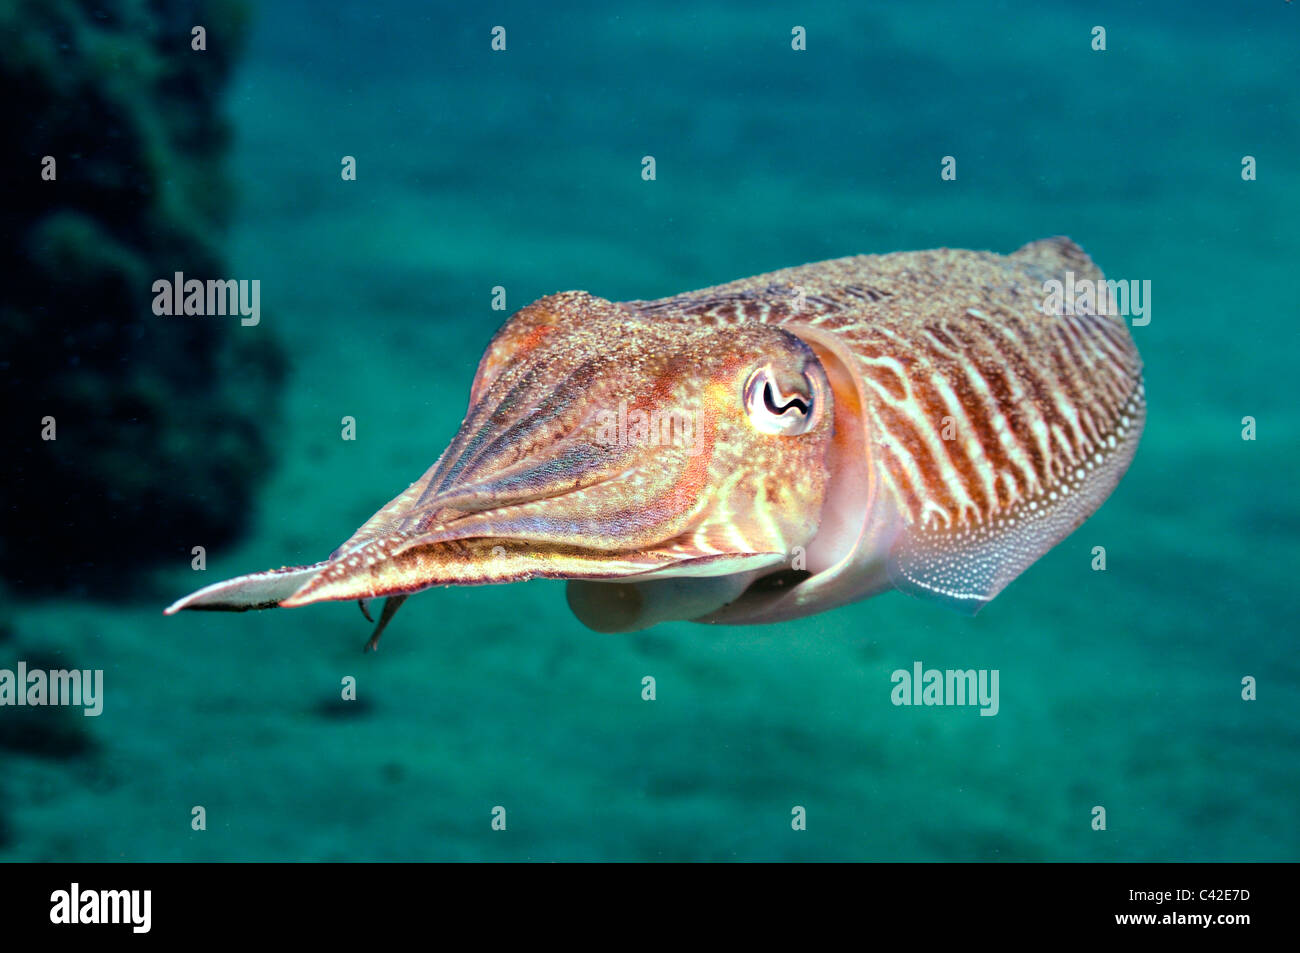 Tintenfisch (Sepia Officinalis) Schwimmen unter Wasser Stockbild